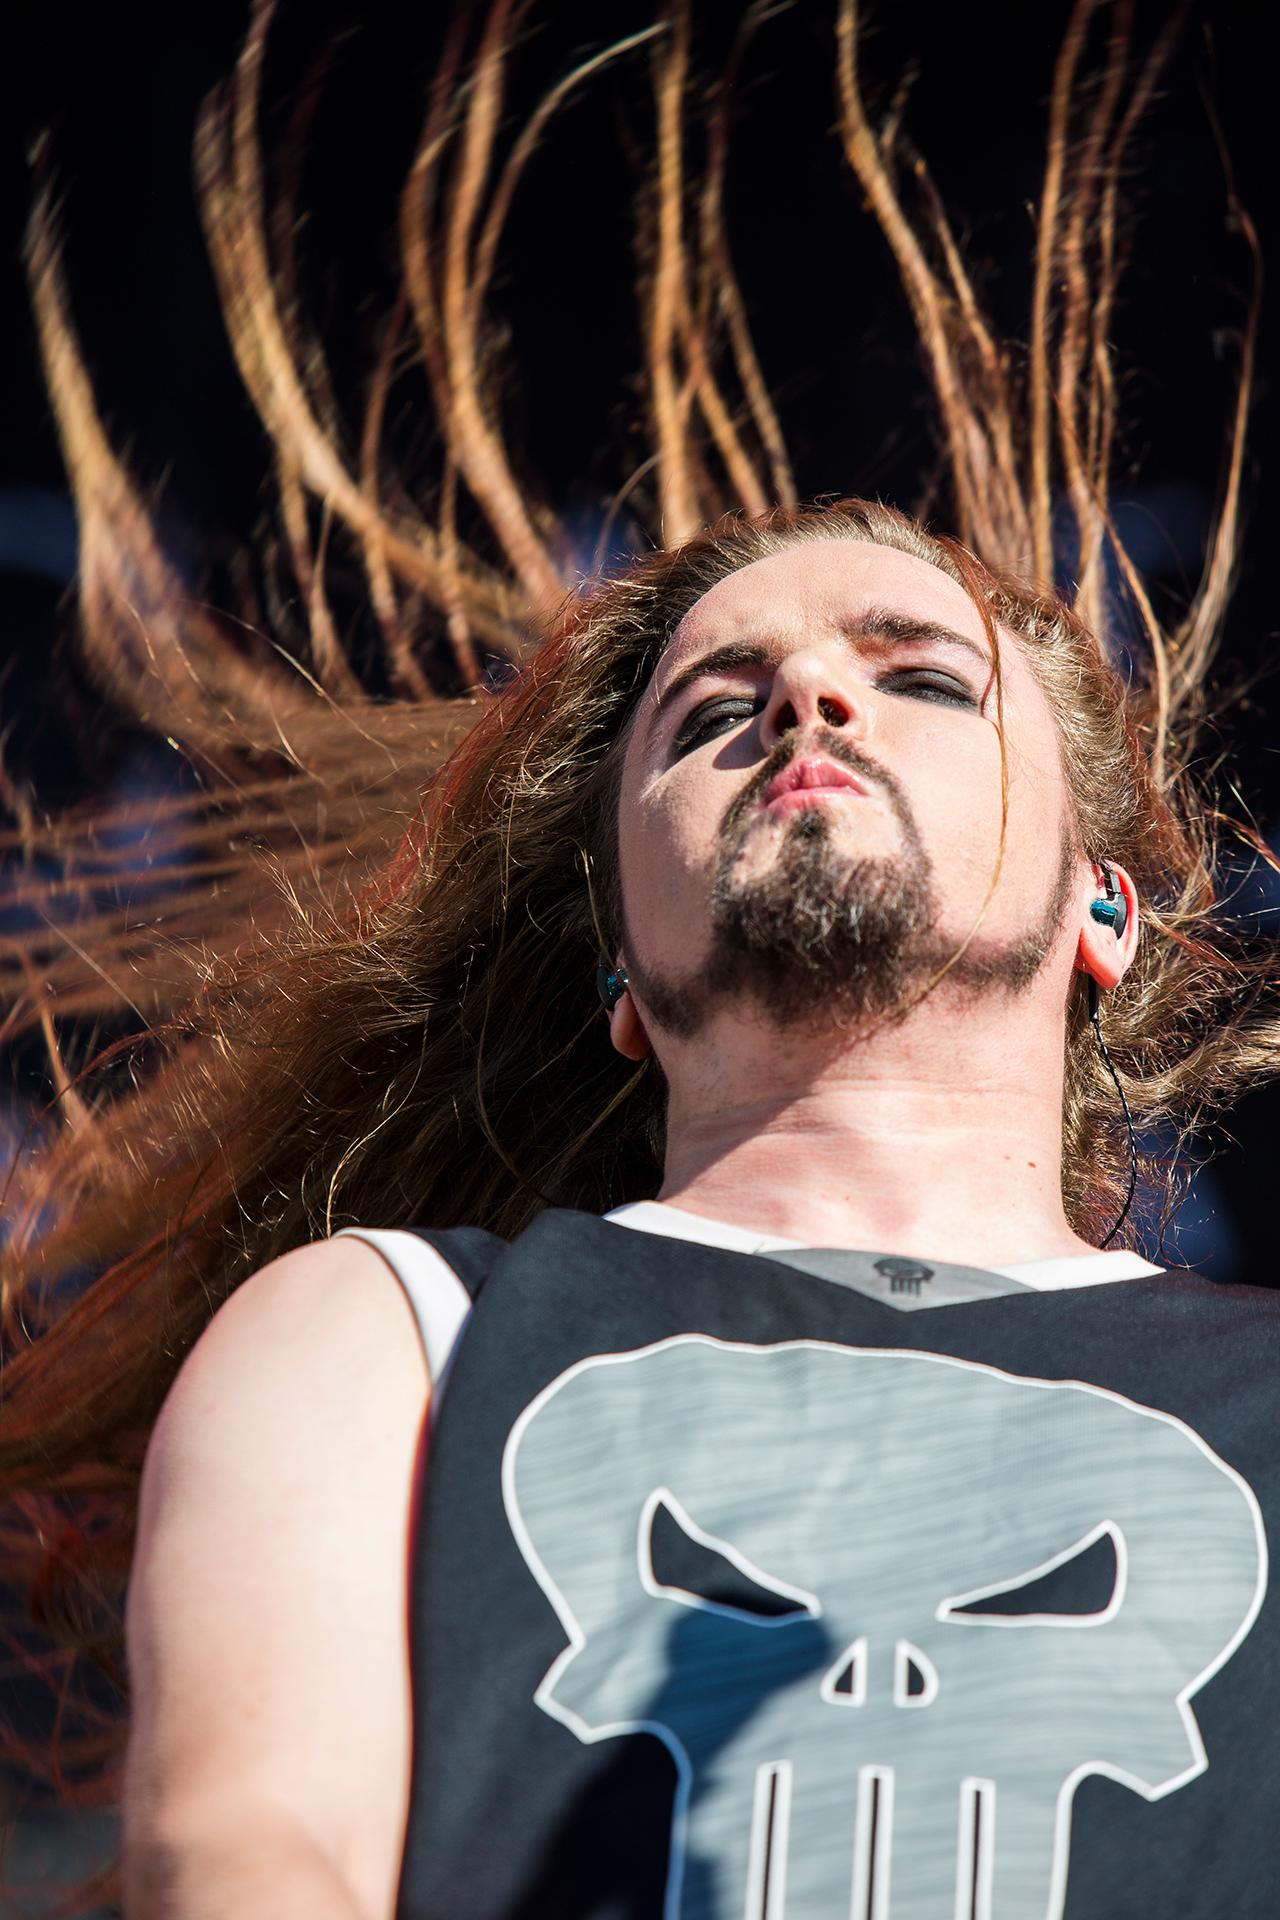 Perttu Kivilaakso, Apocalyptica band, Tuska metal festival